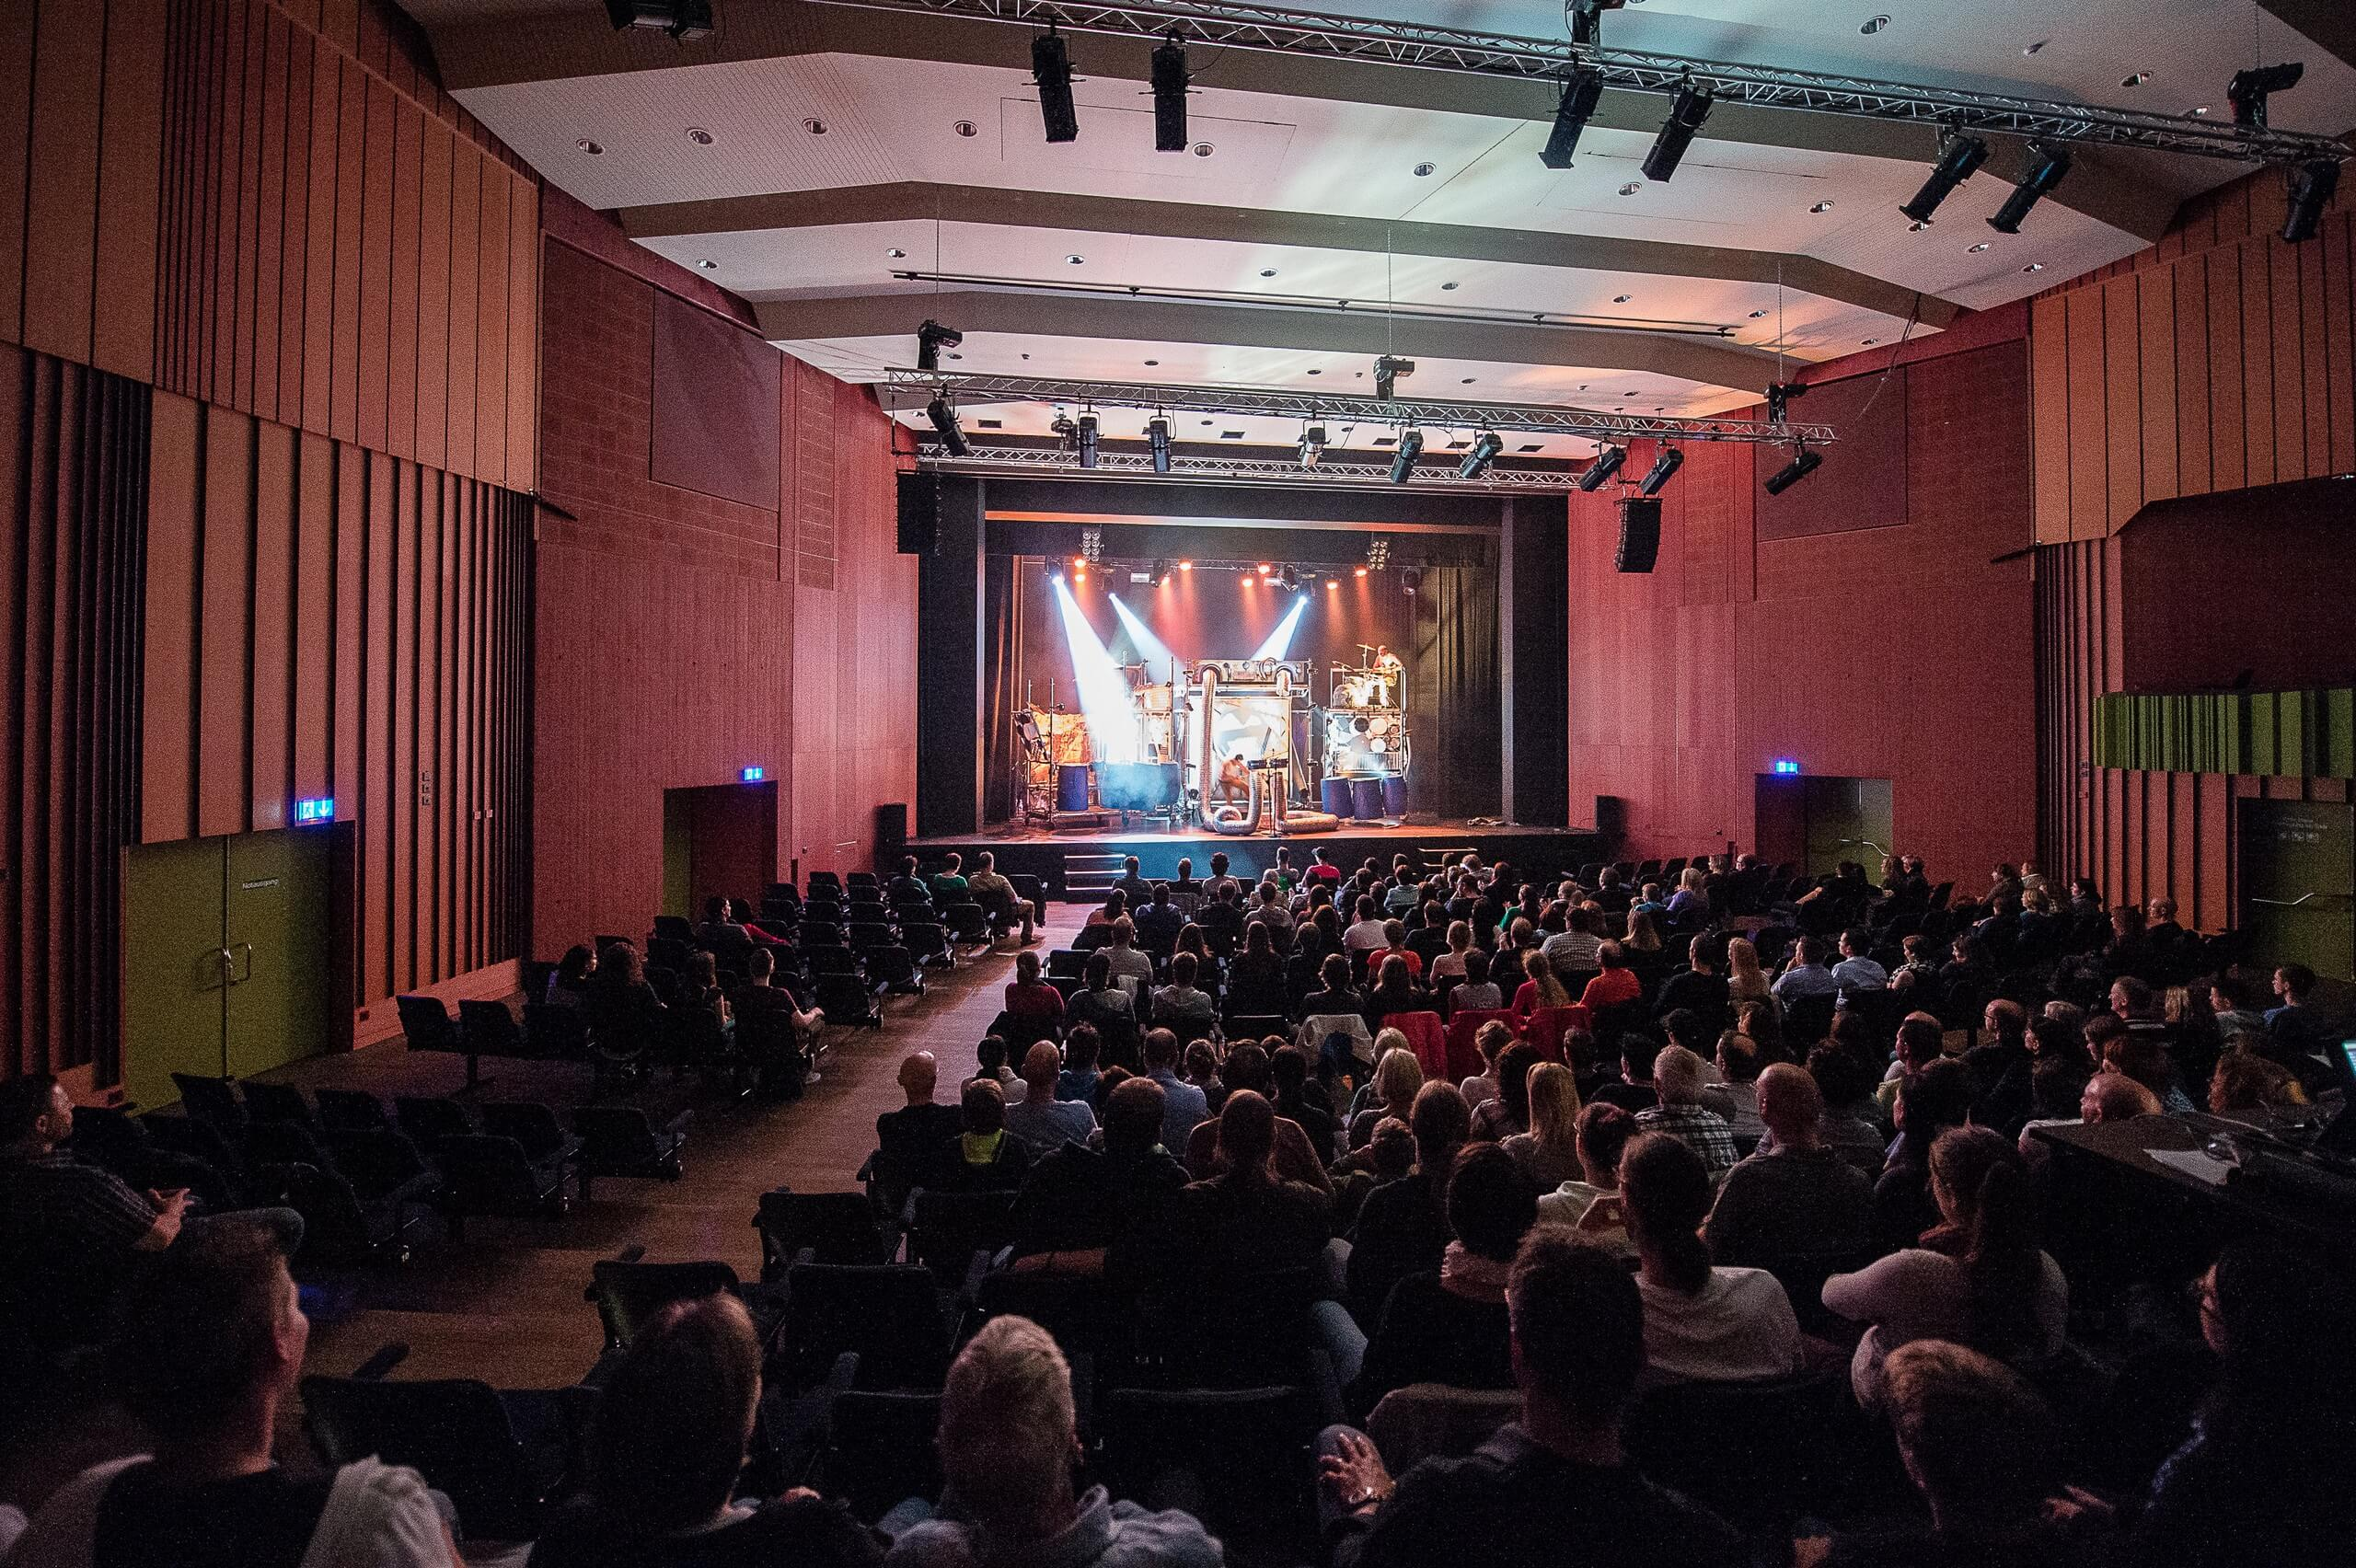 thun-kkthun-schadausaal-kultur-und-kongress-zentrum